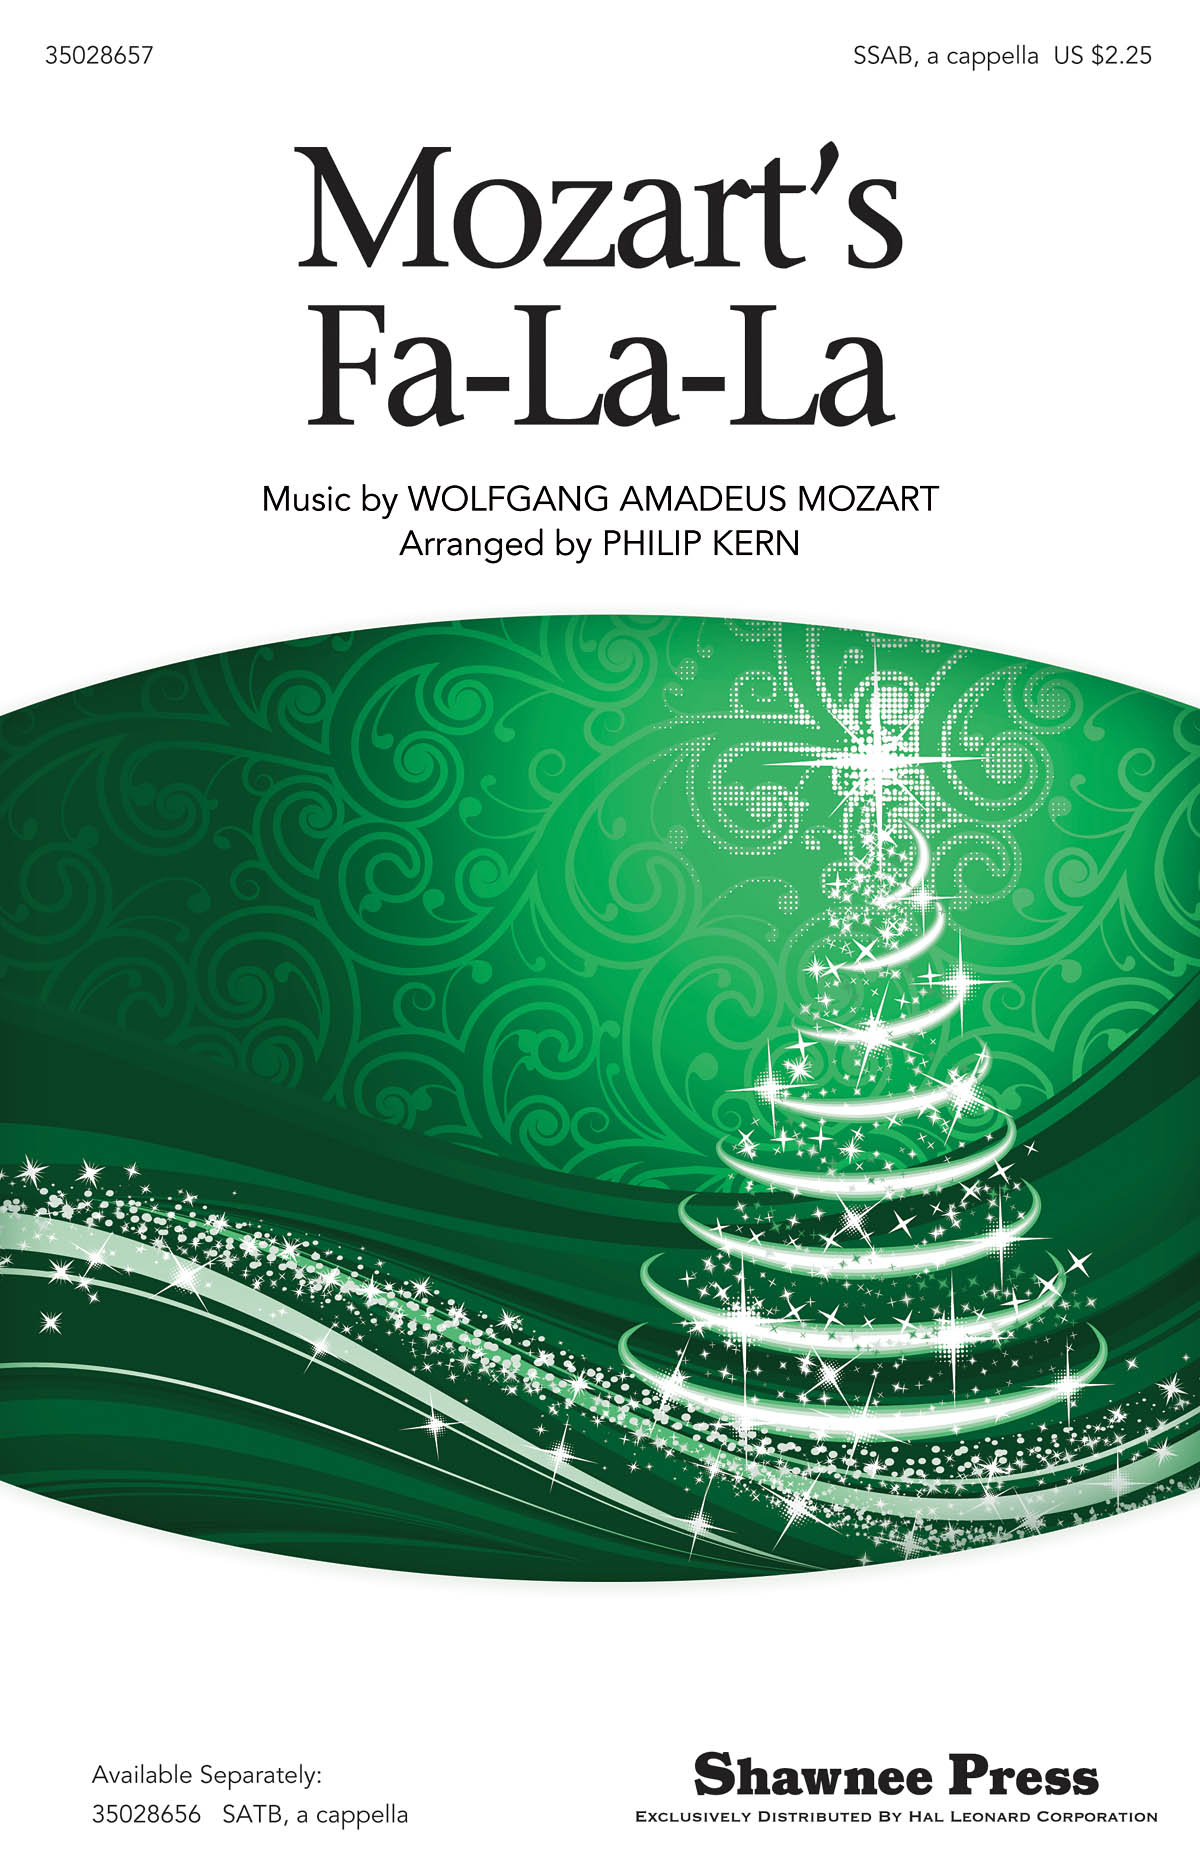 Wolfgang Amadeus Mozart: Mozart's Fa-la-la: Mixed Choir: Vocal Score